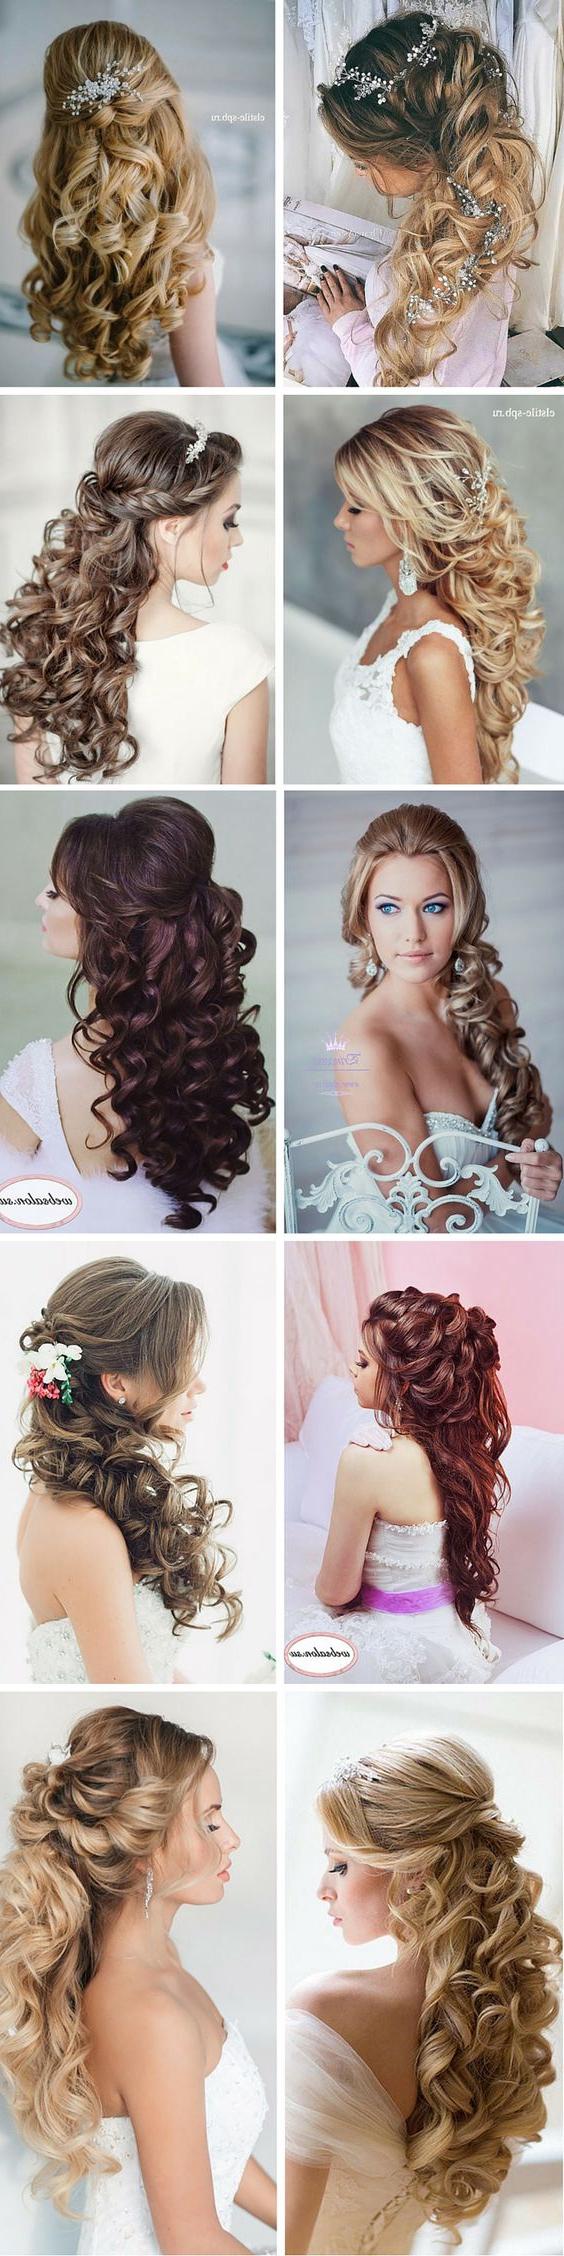 elegant-curly-half-up-half-down-wedding-hairstyles